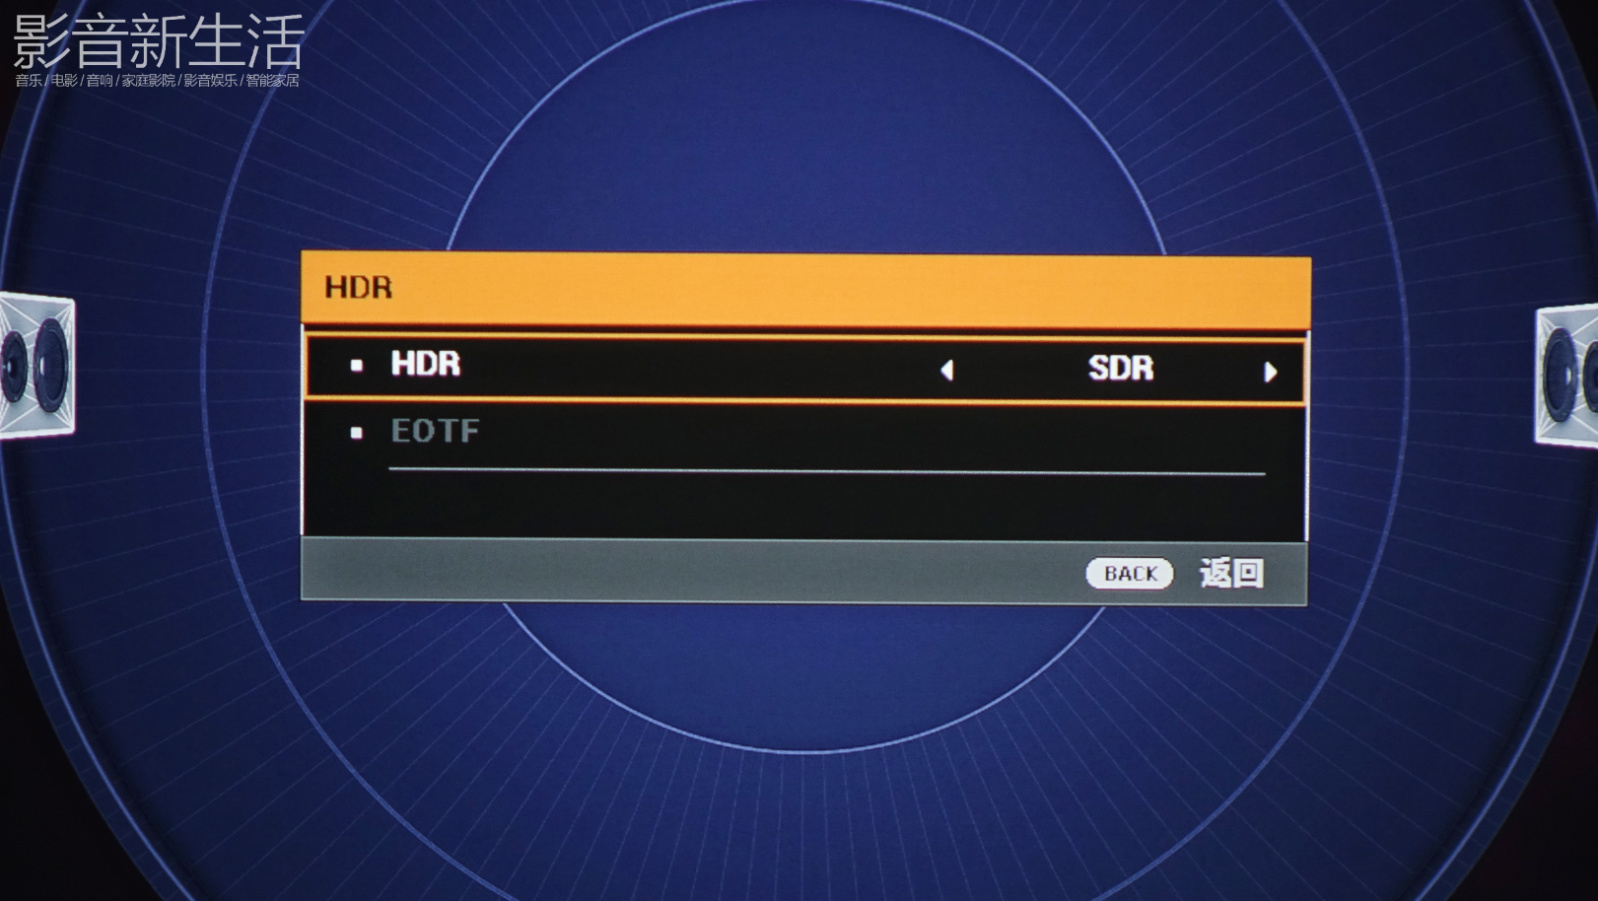 "JVC DLP UH1 Menu9 - 推荐 | ""无法抗拒的色彩诱惑,普及家用4K/UHD投影的新尝试!"" JVC DLP LX-UH1 投影机"